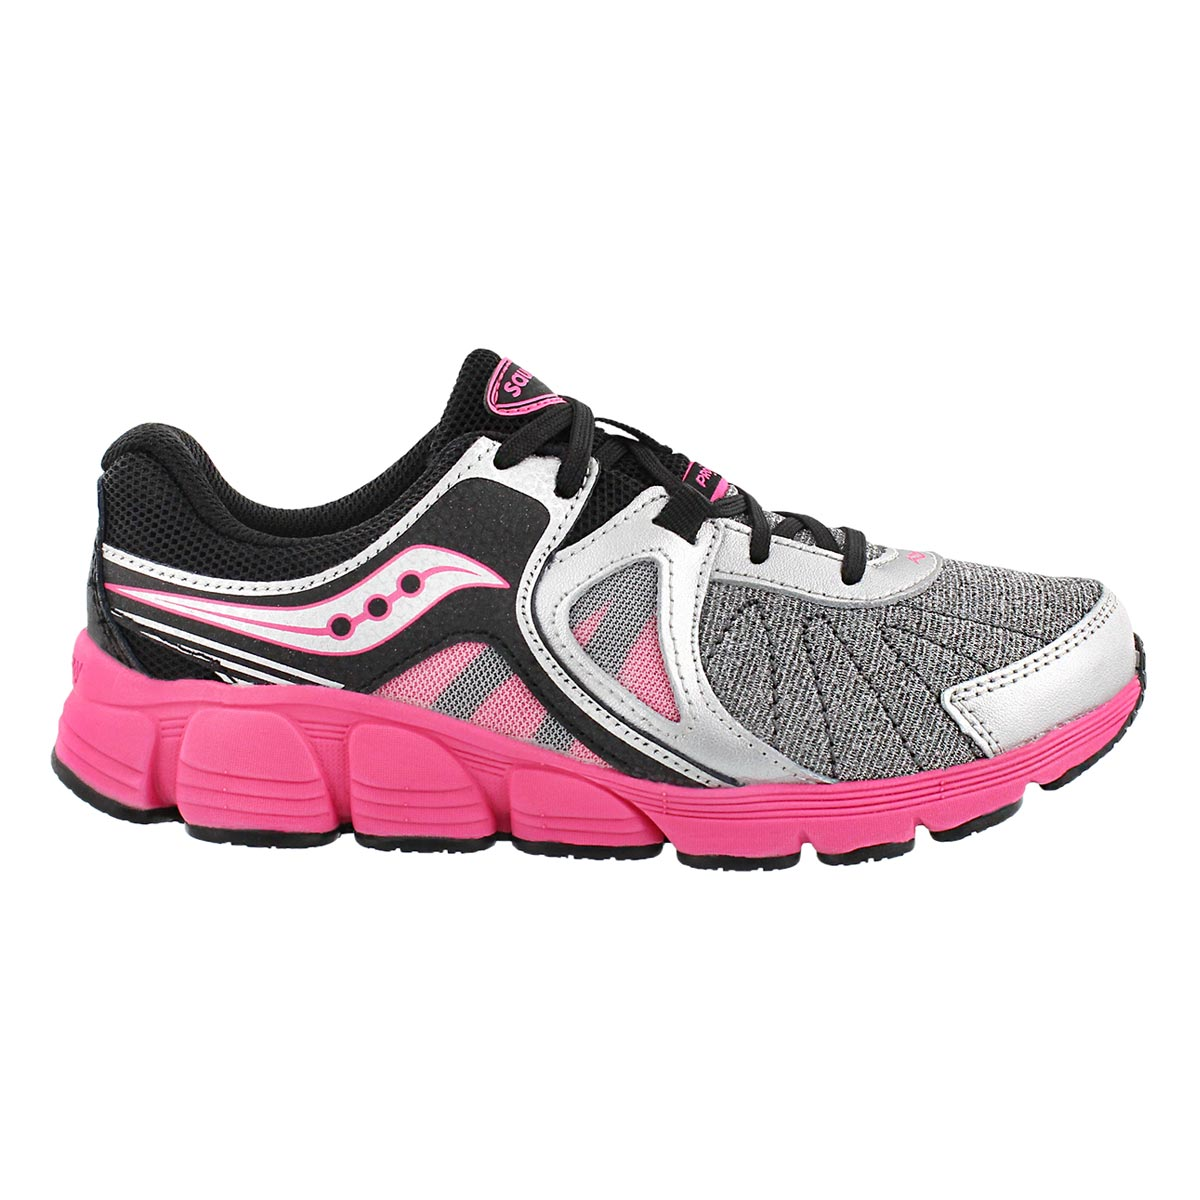 Grls Kotaro 3 silv/pnk lace up runner